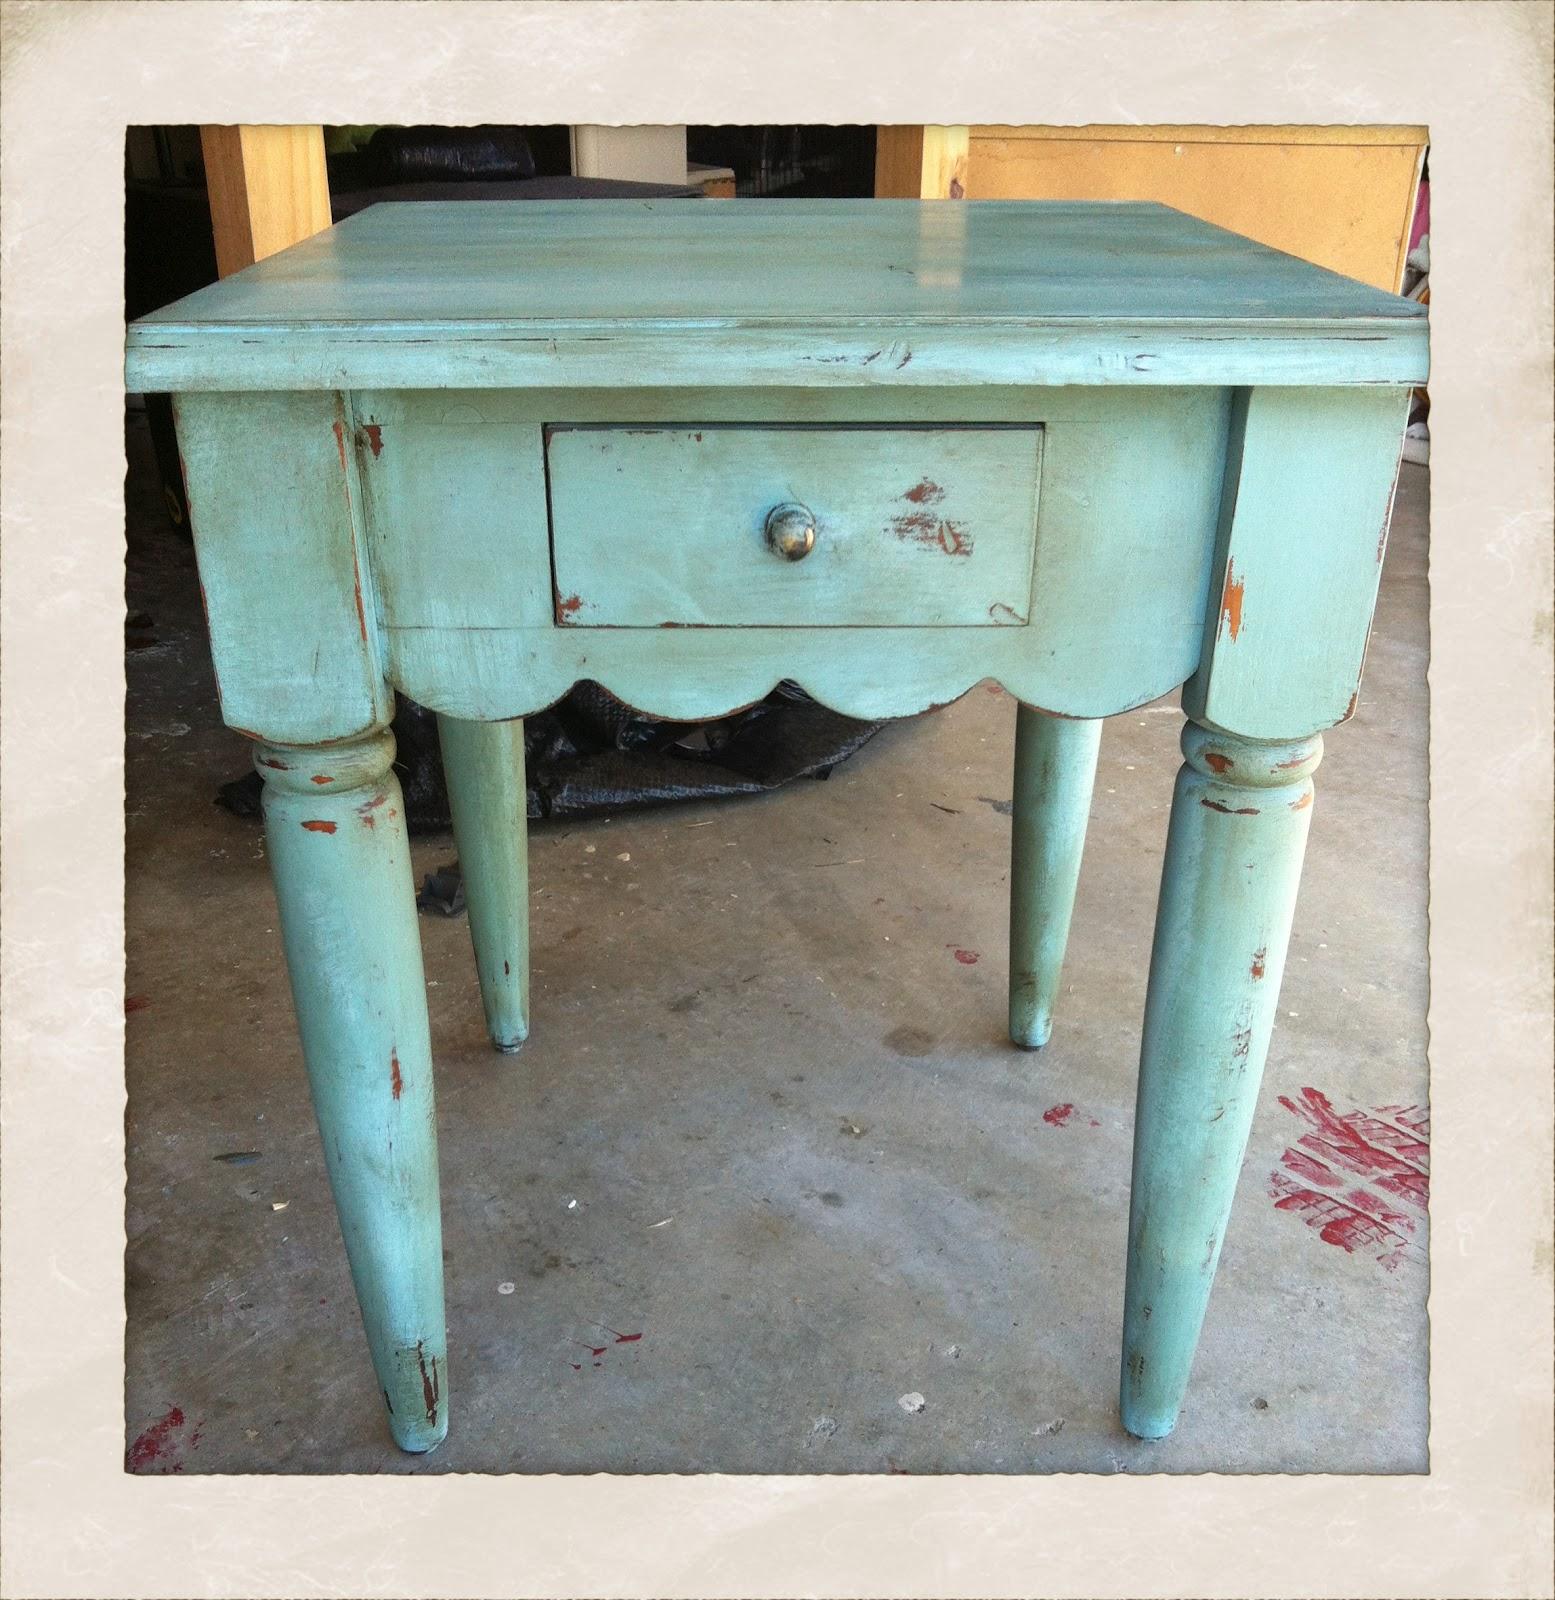 Wax For Antique Furniture - Wax For Antique Furniture Antique Furniture